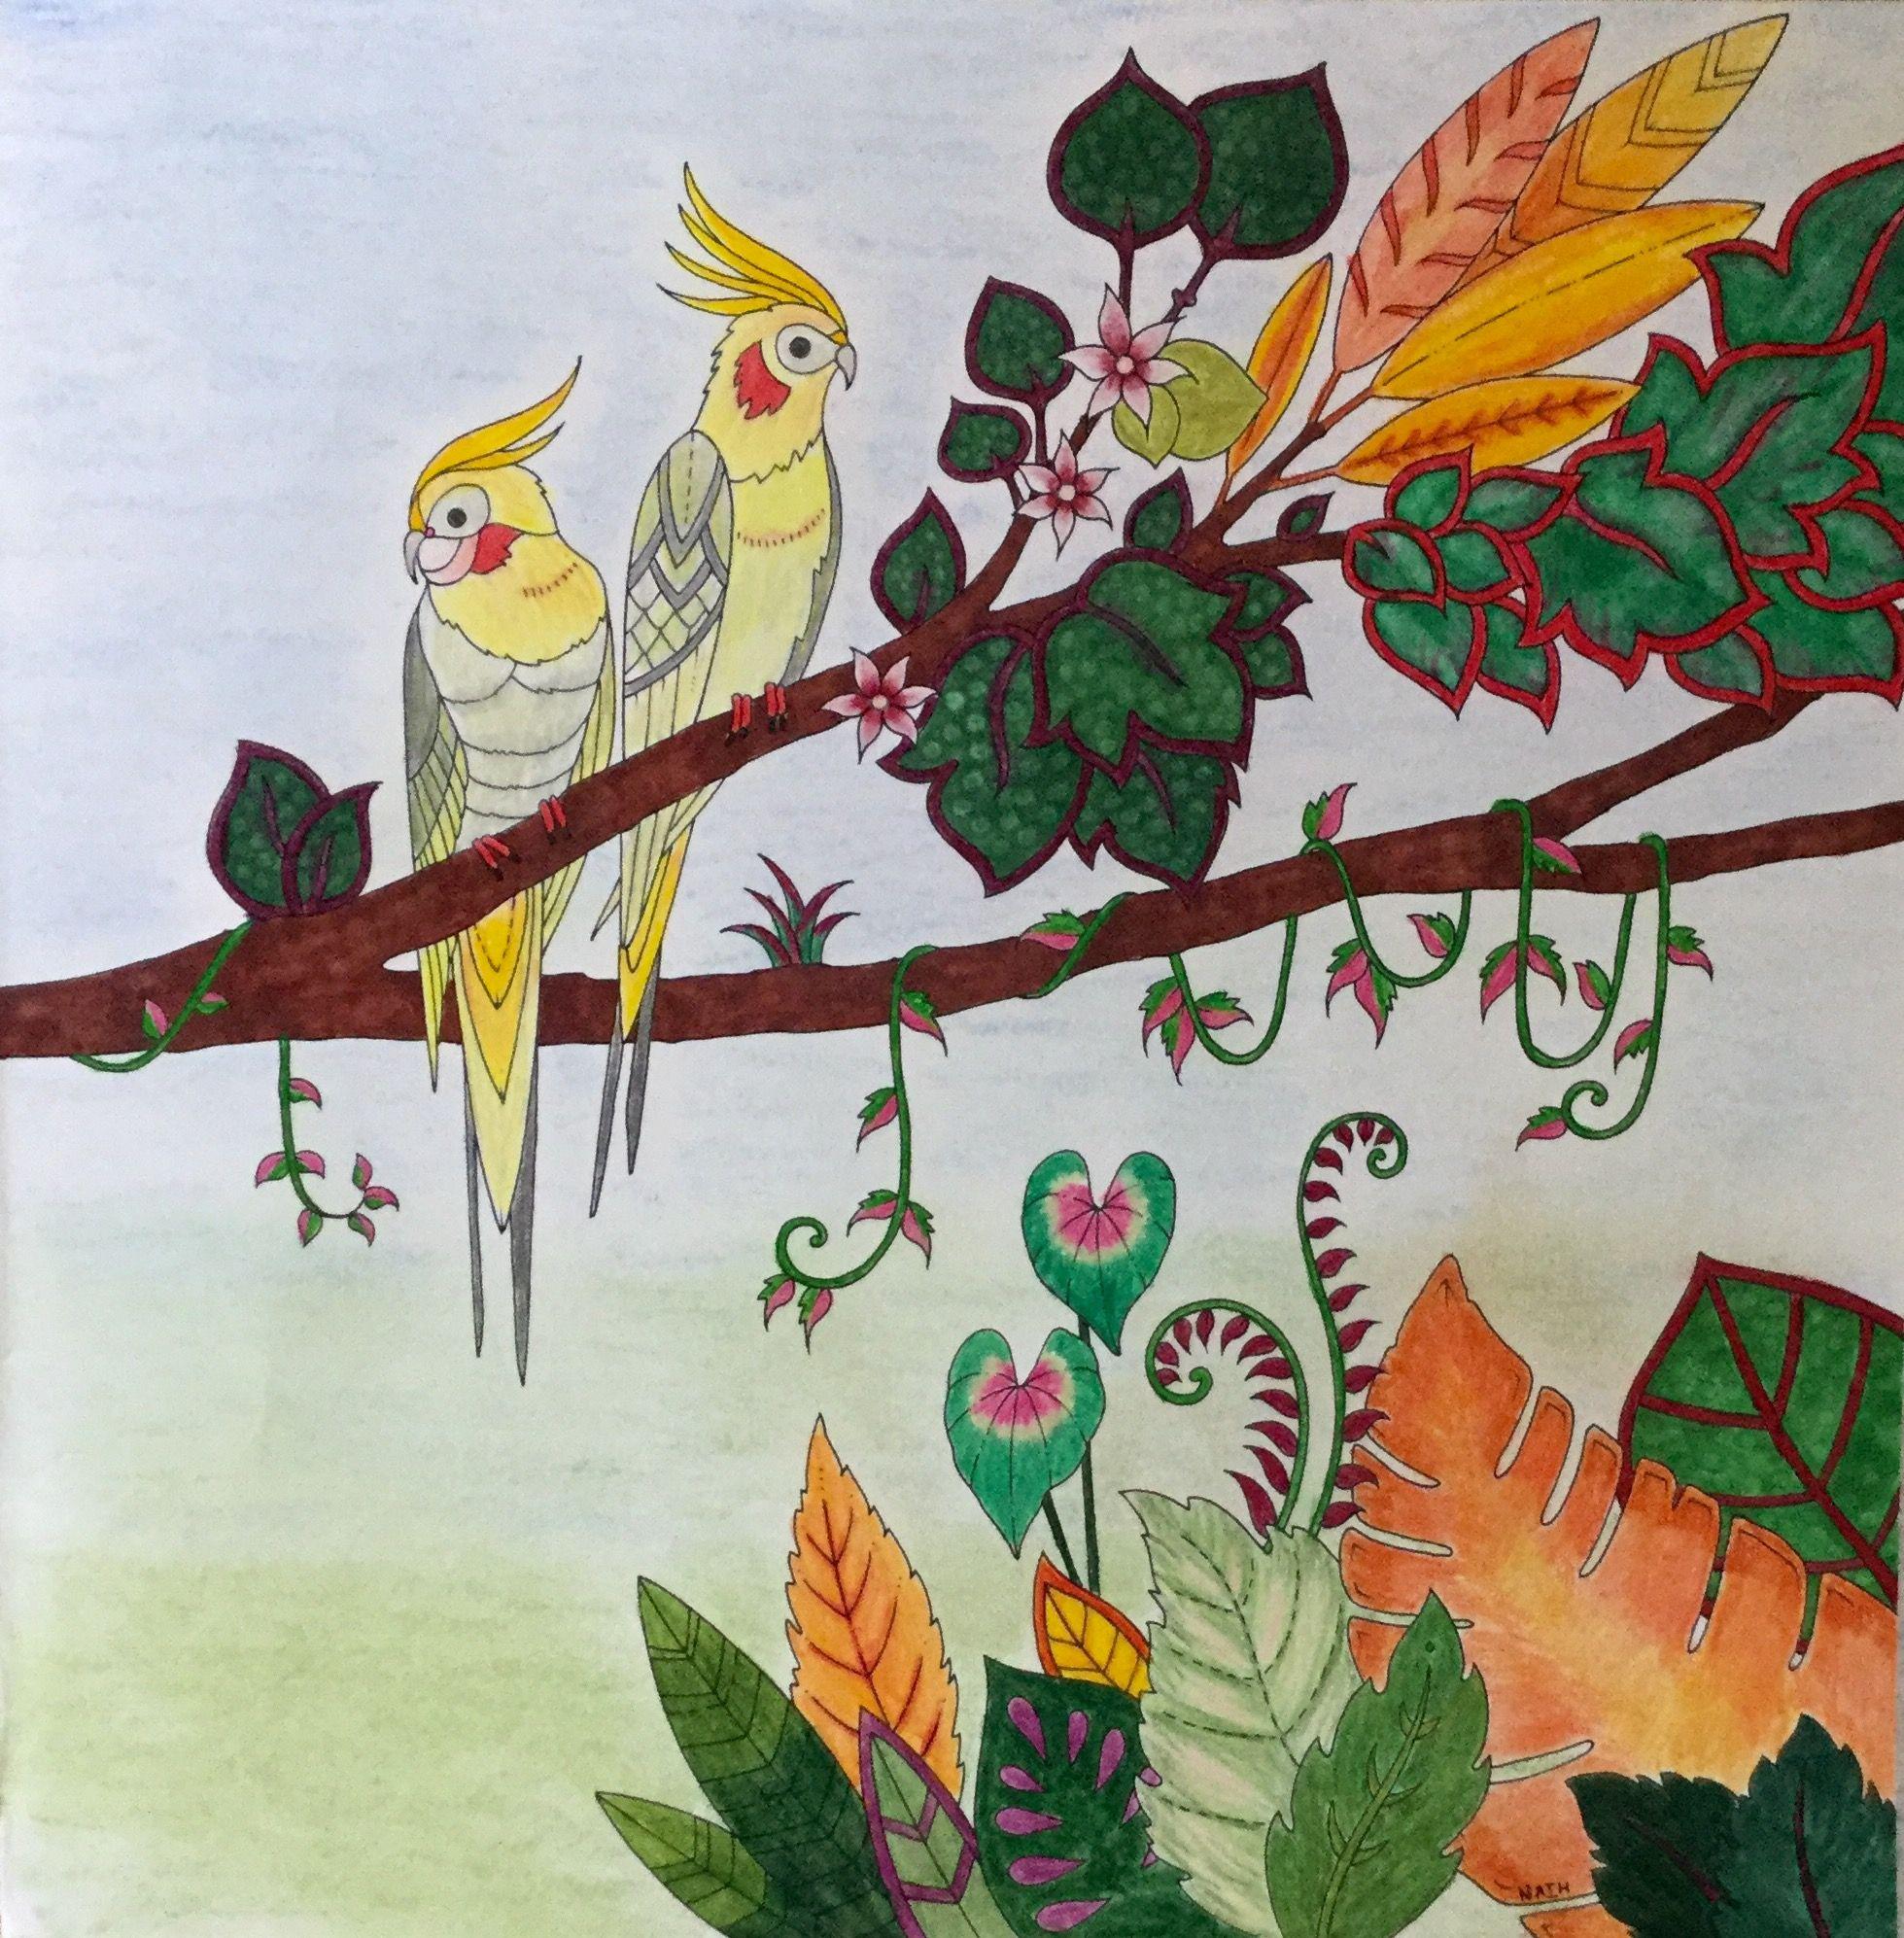 My coloring johanna basford magical jungle cockatiel calopsitte the magical jungle in 2018 - Dessin calopsitte ...